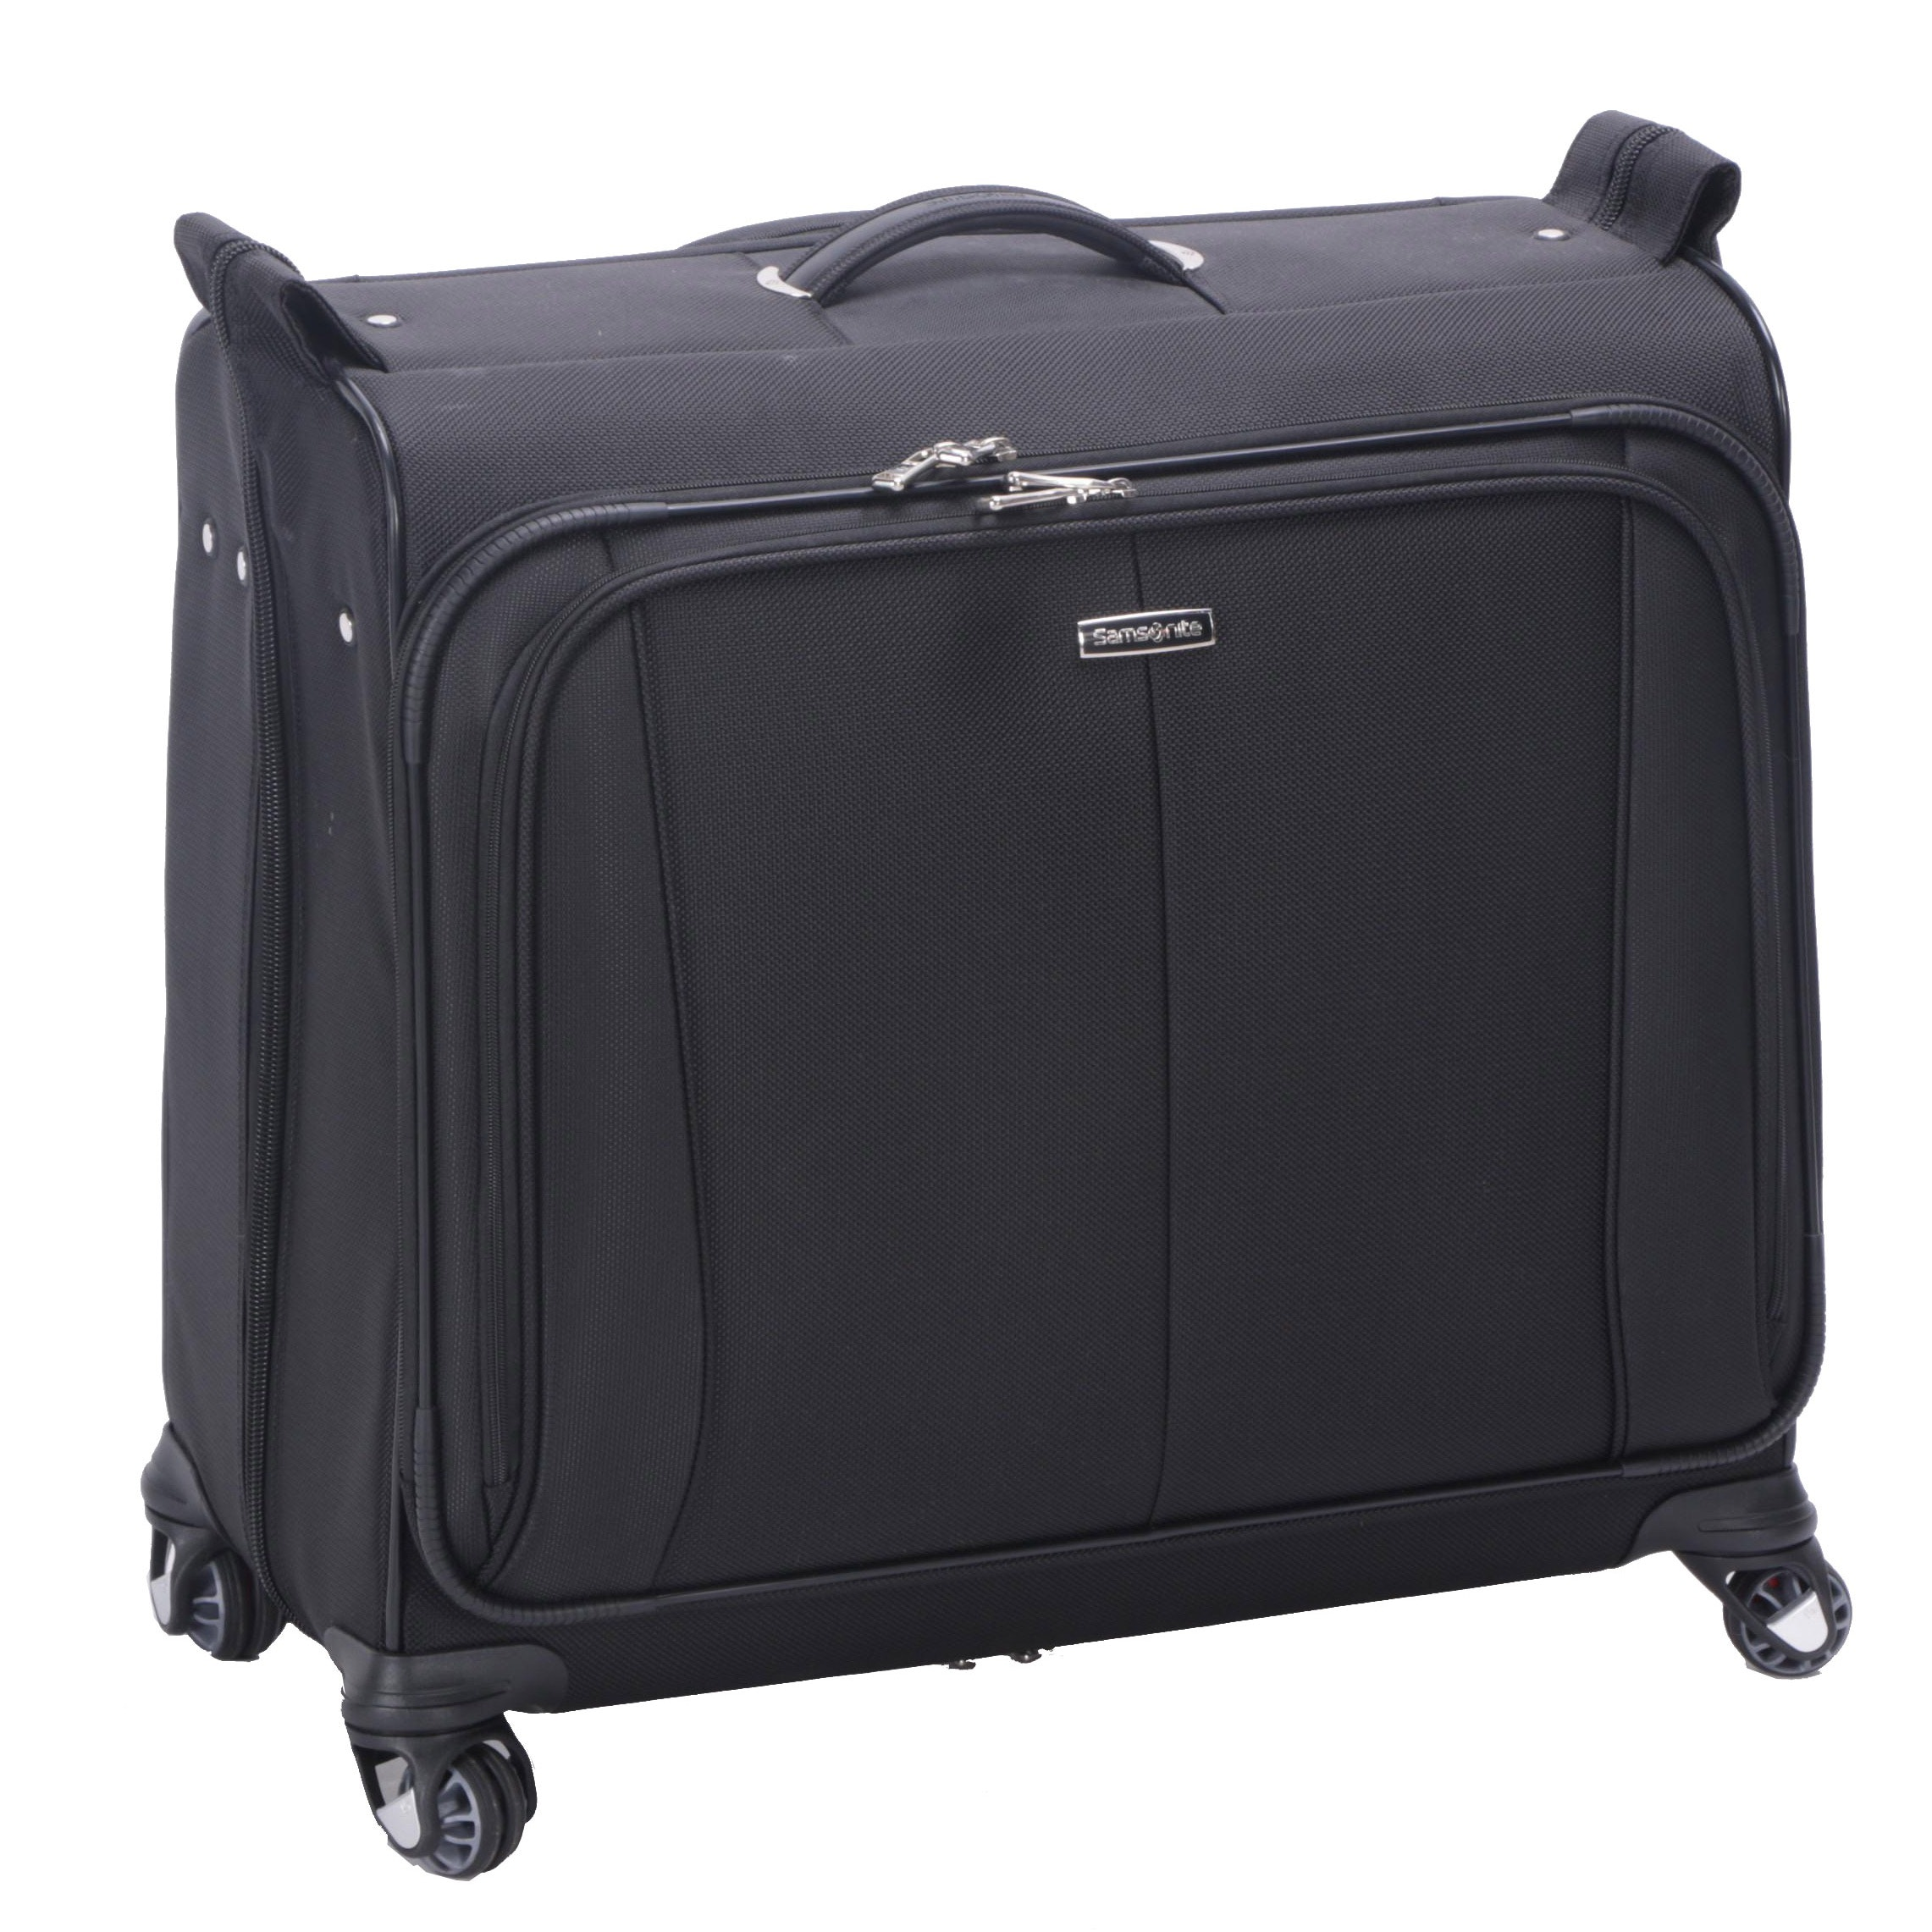 Samsonite Wheeled Garment Bag in Black